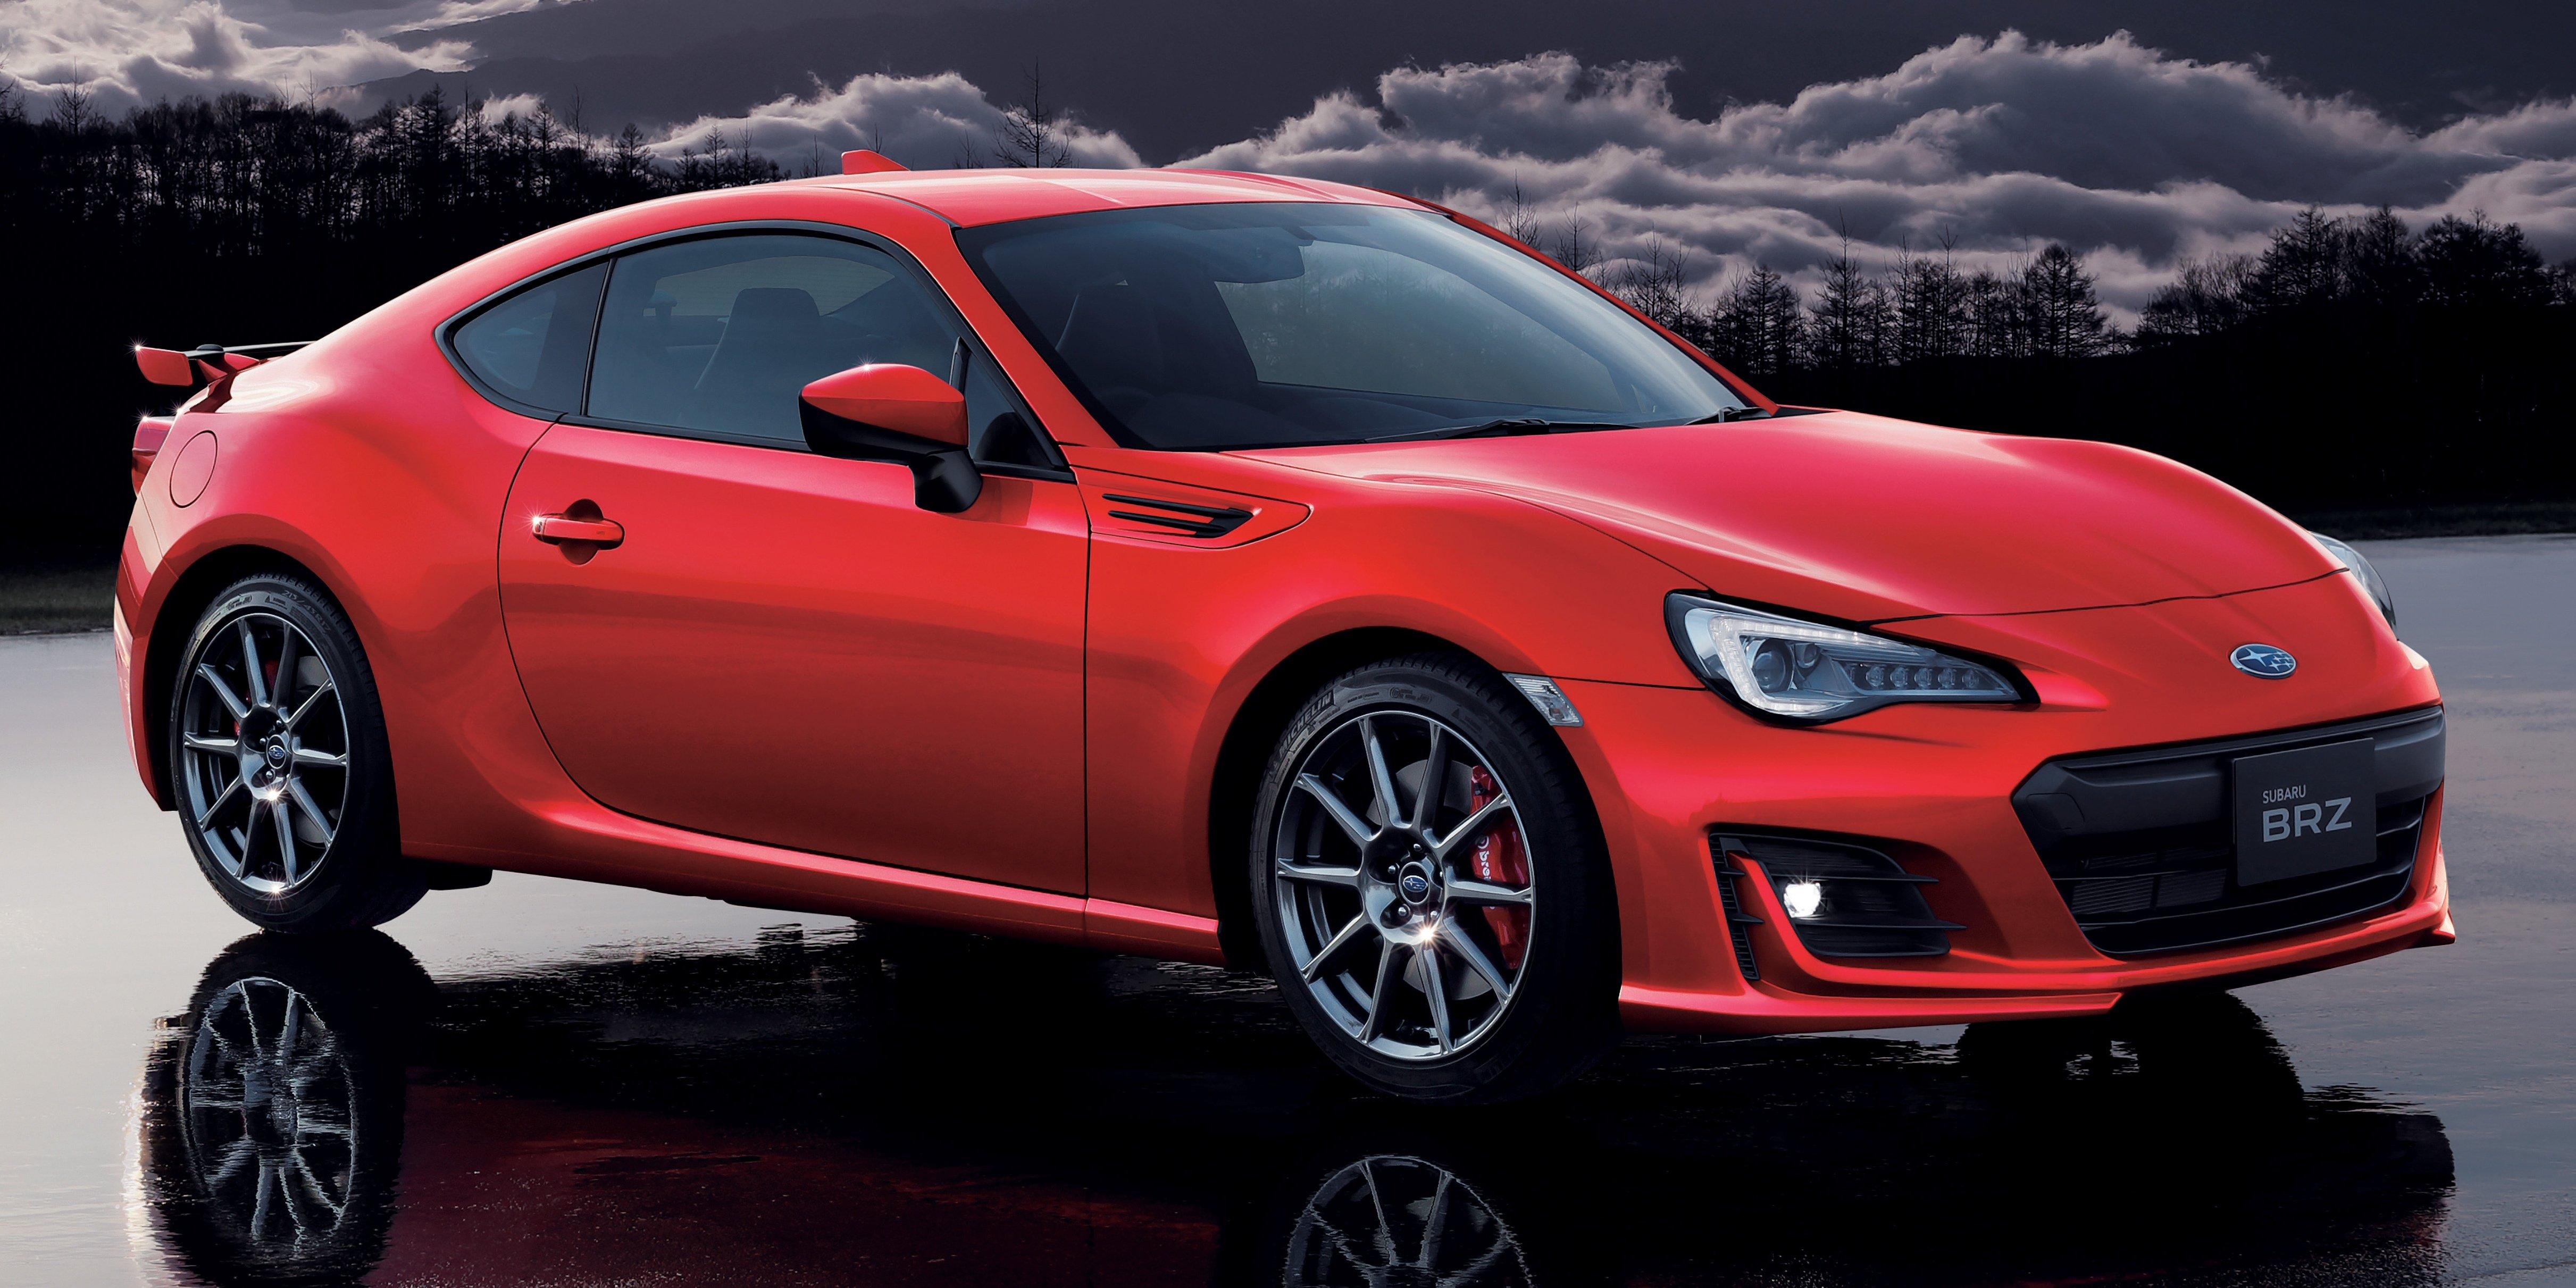 Subaru brz gt – Tag – Auto Breaking News